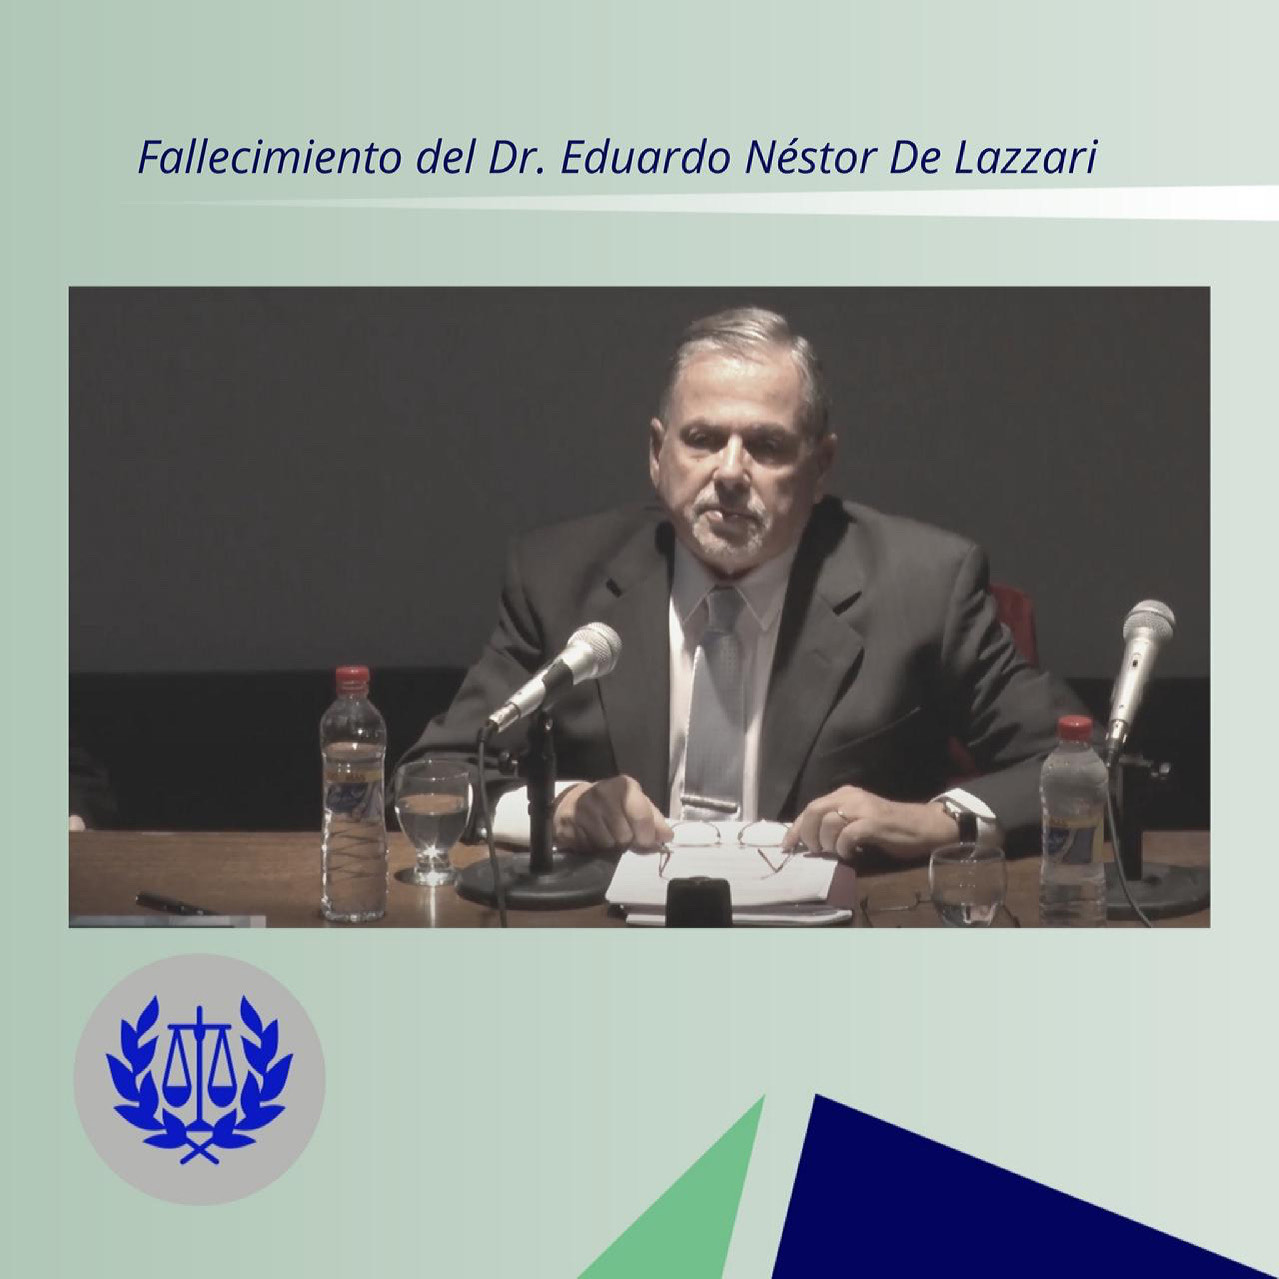 Fallecimiento del Dr. Eduardo Néstor De Lazzari